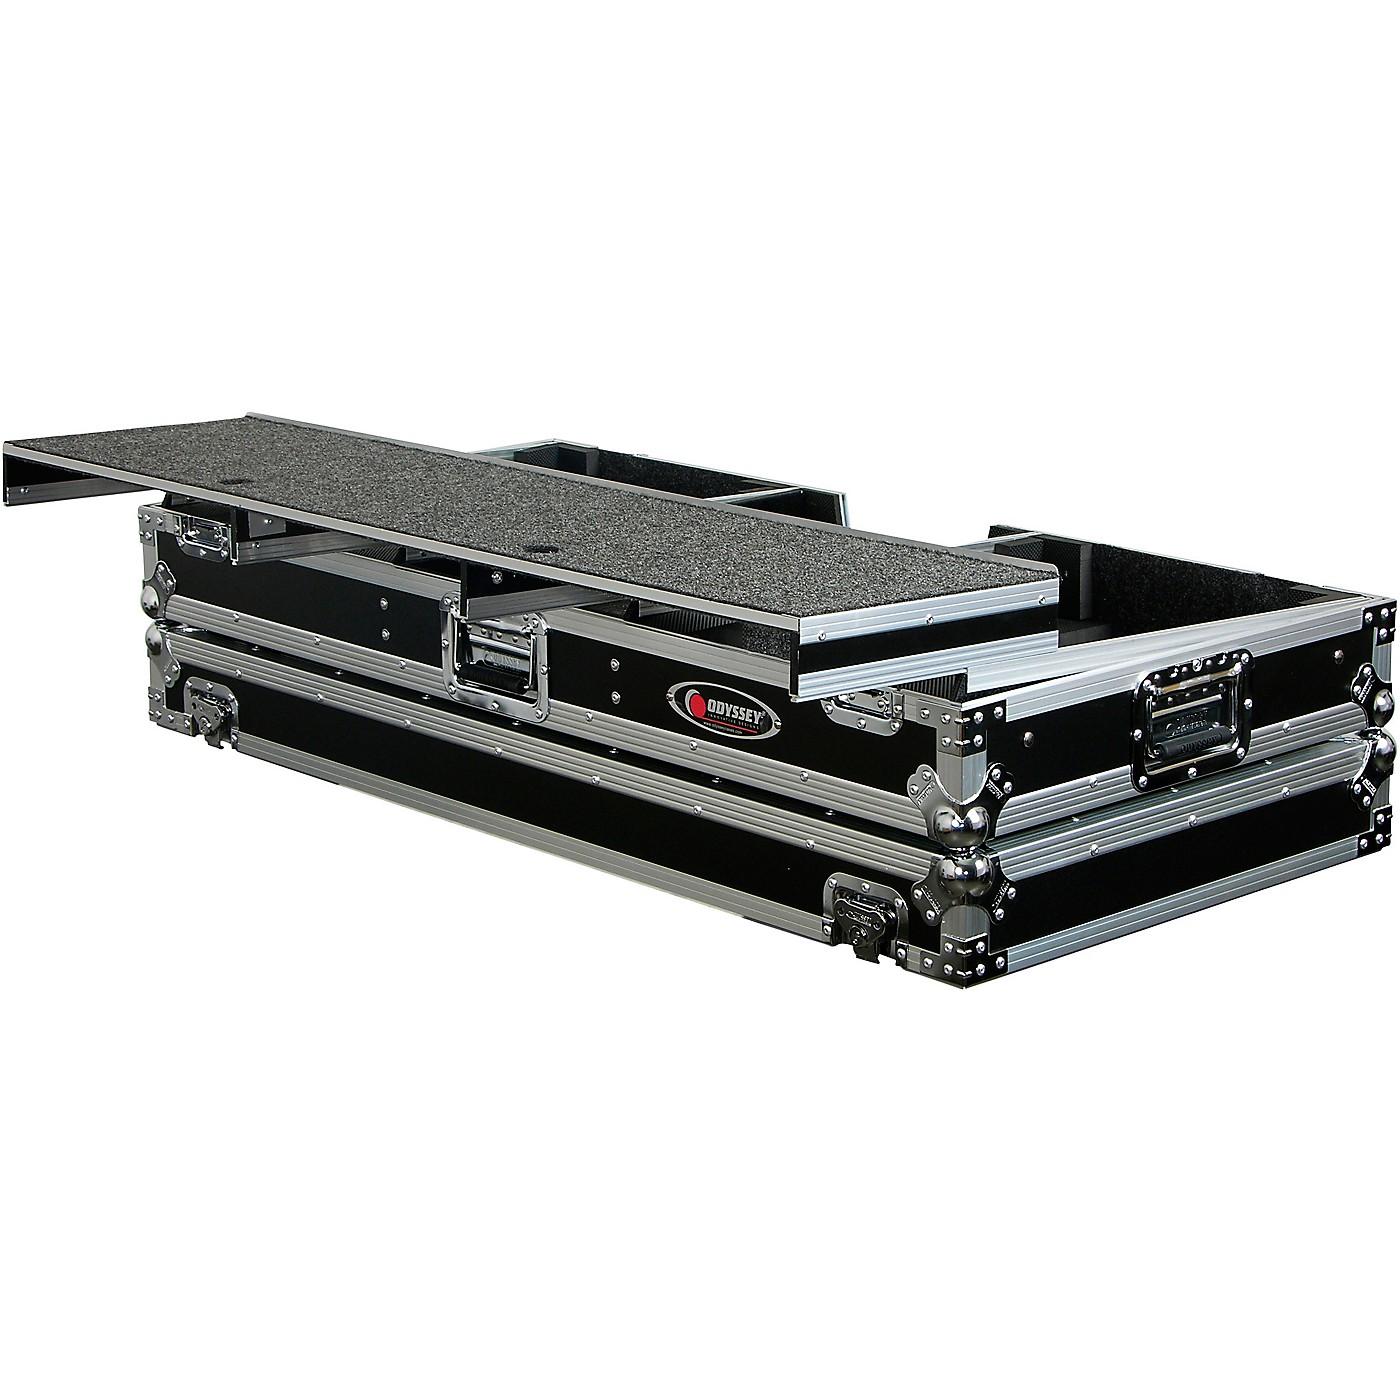 Odyssey FZGSPDJ12W Universal Turntable DJ Coffin with Wheels thumbnail